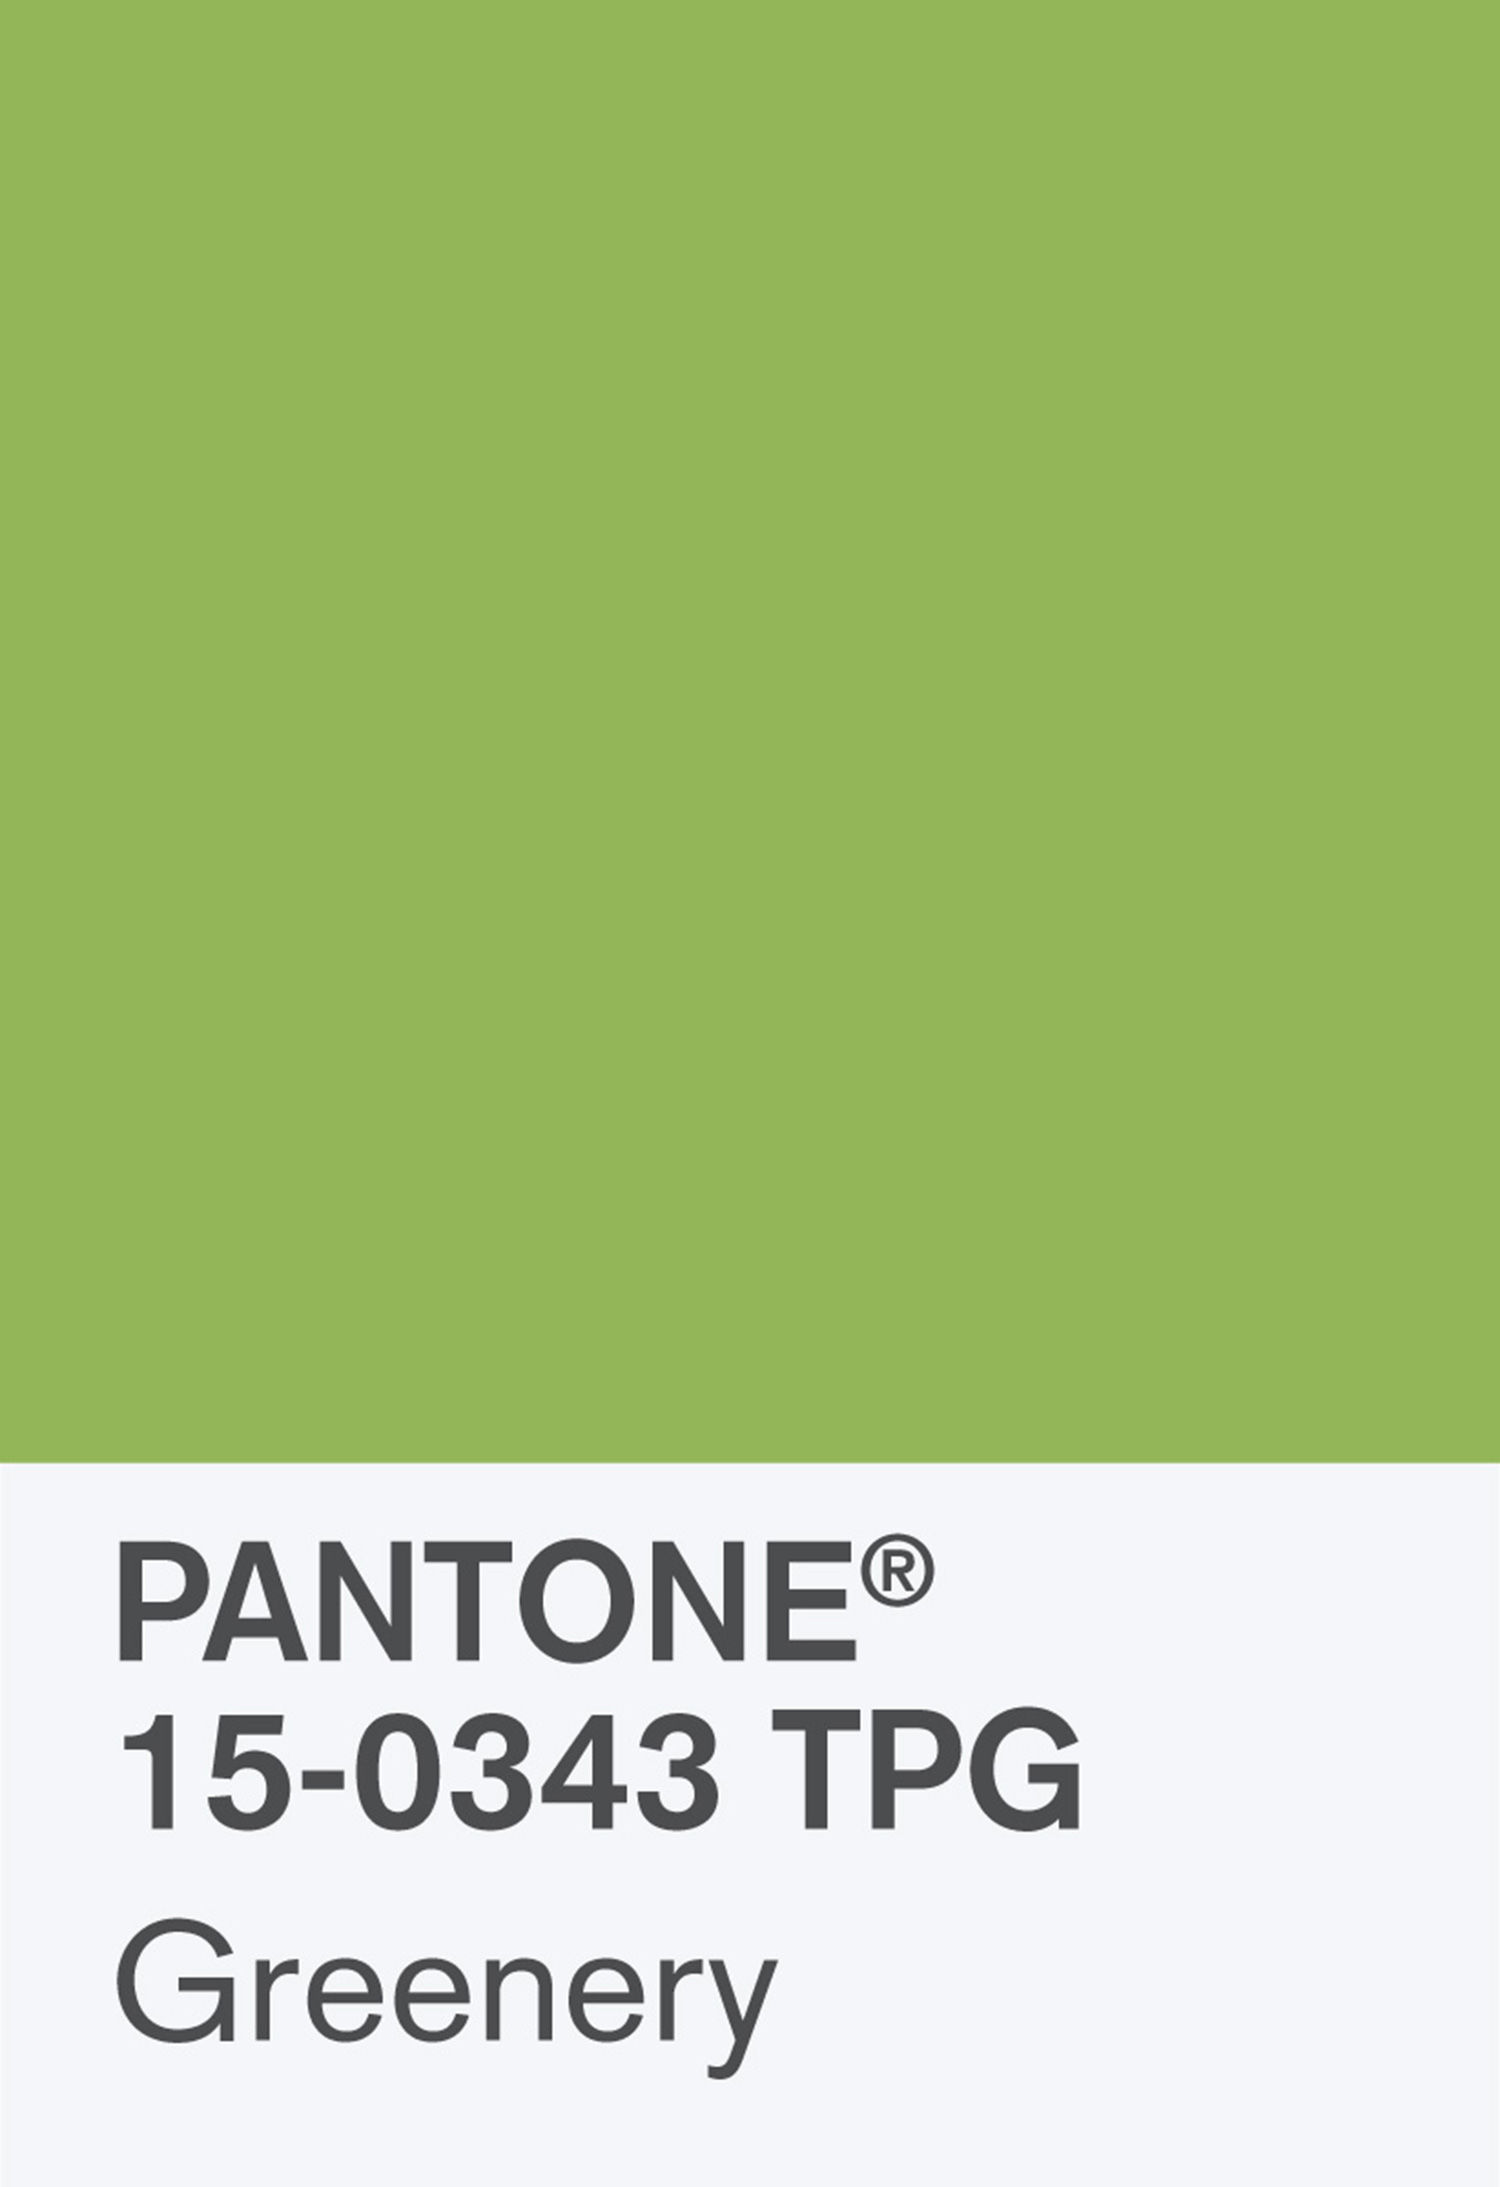 pantonechip-15-0343-tpg-greenery